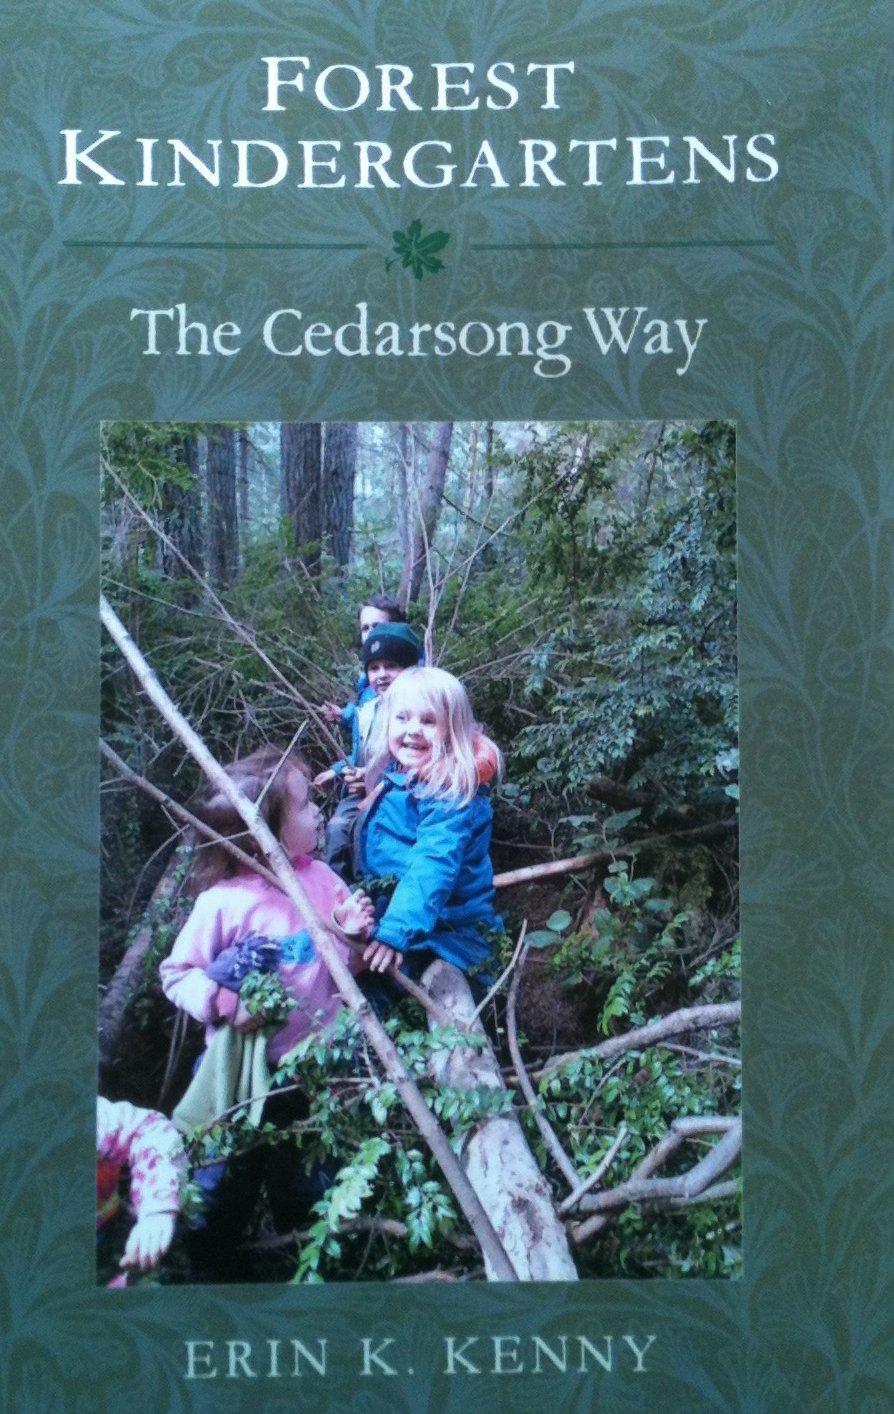 Forest Kindergartens: The Cedarsong Way: Erin K. Kenny, Erin Kenny ...